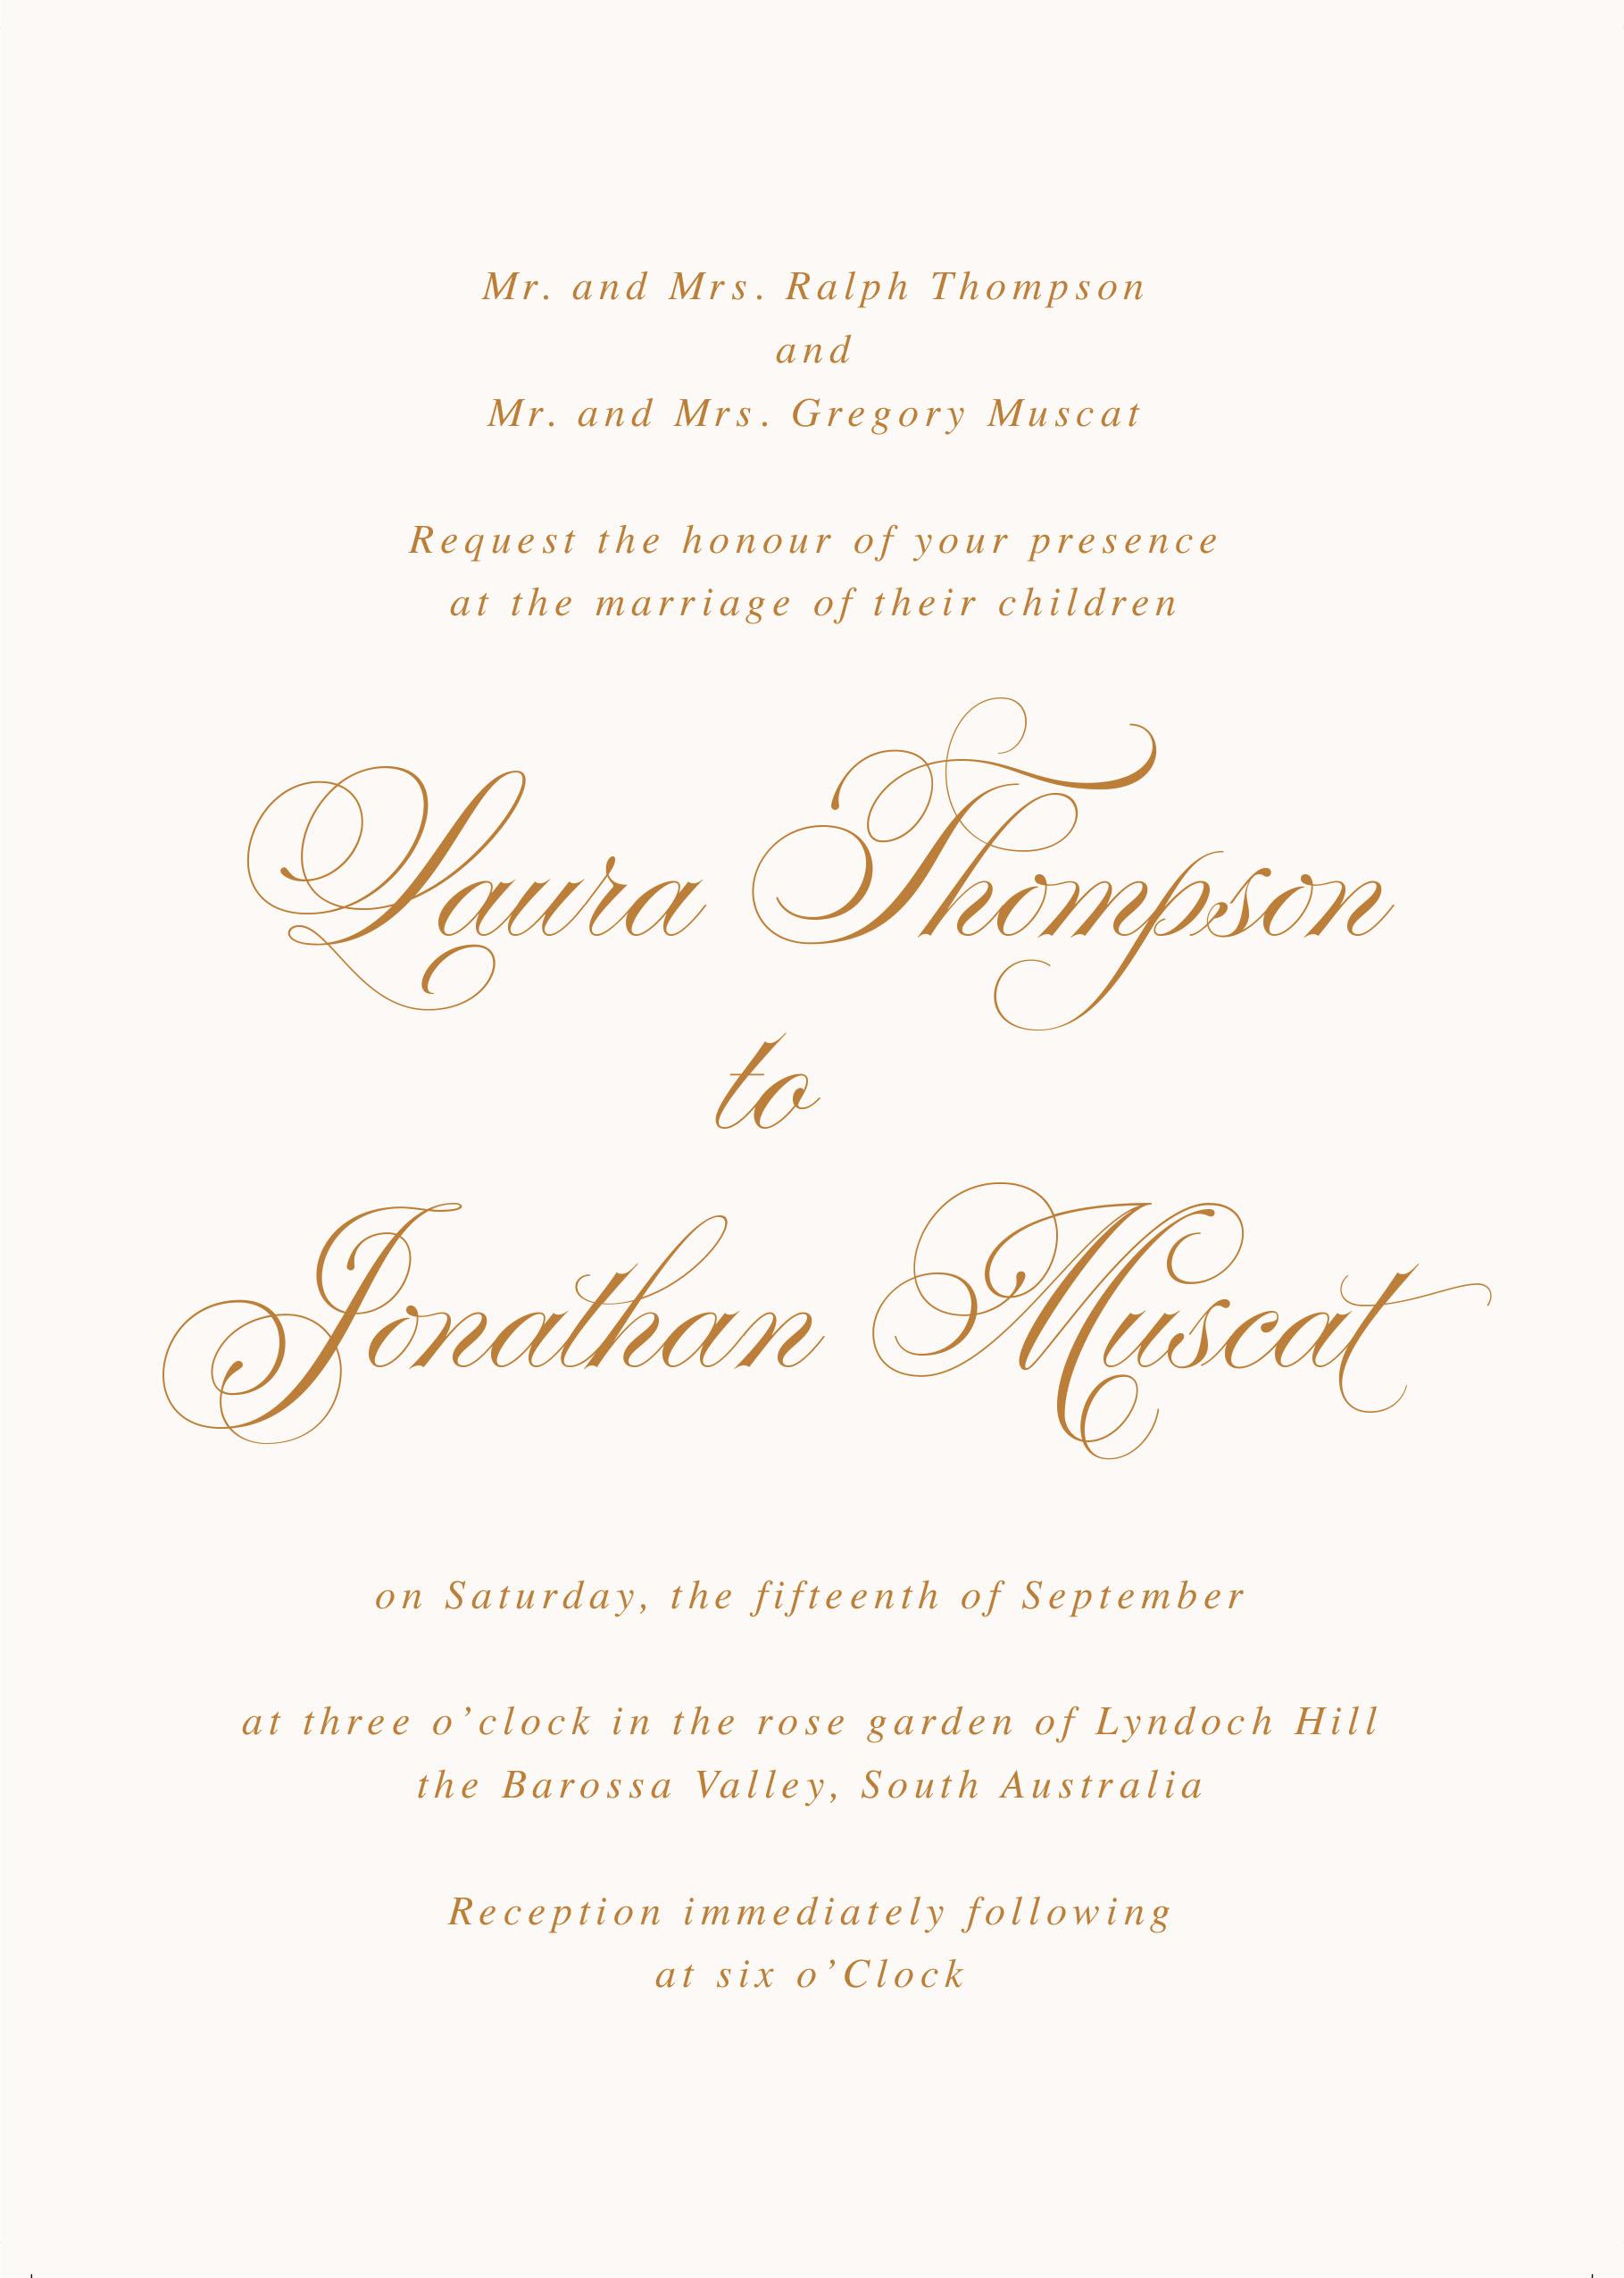 Wedding Invitation From Child Wording Elegant formal Wording for Wedding Invitations Traditional